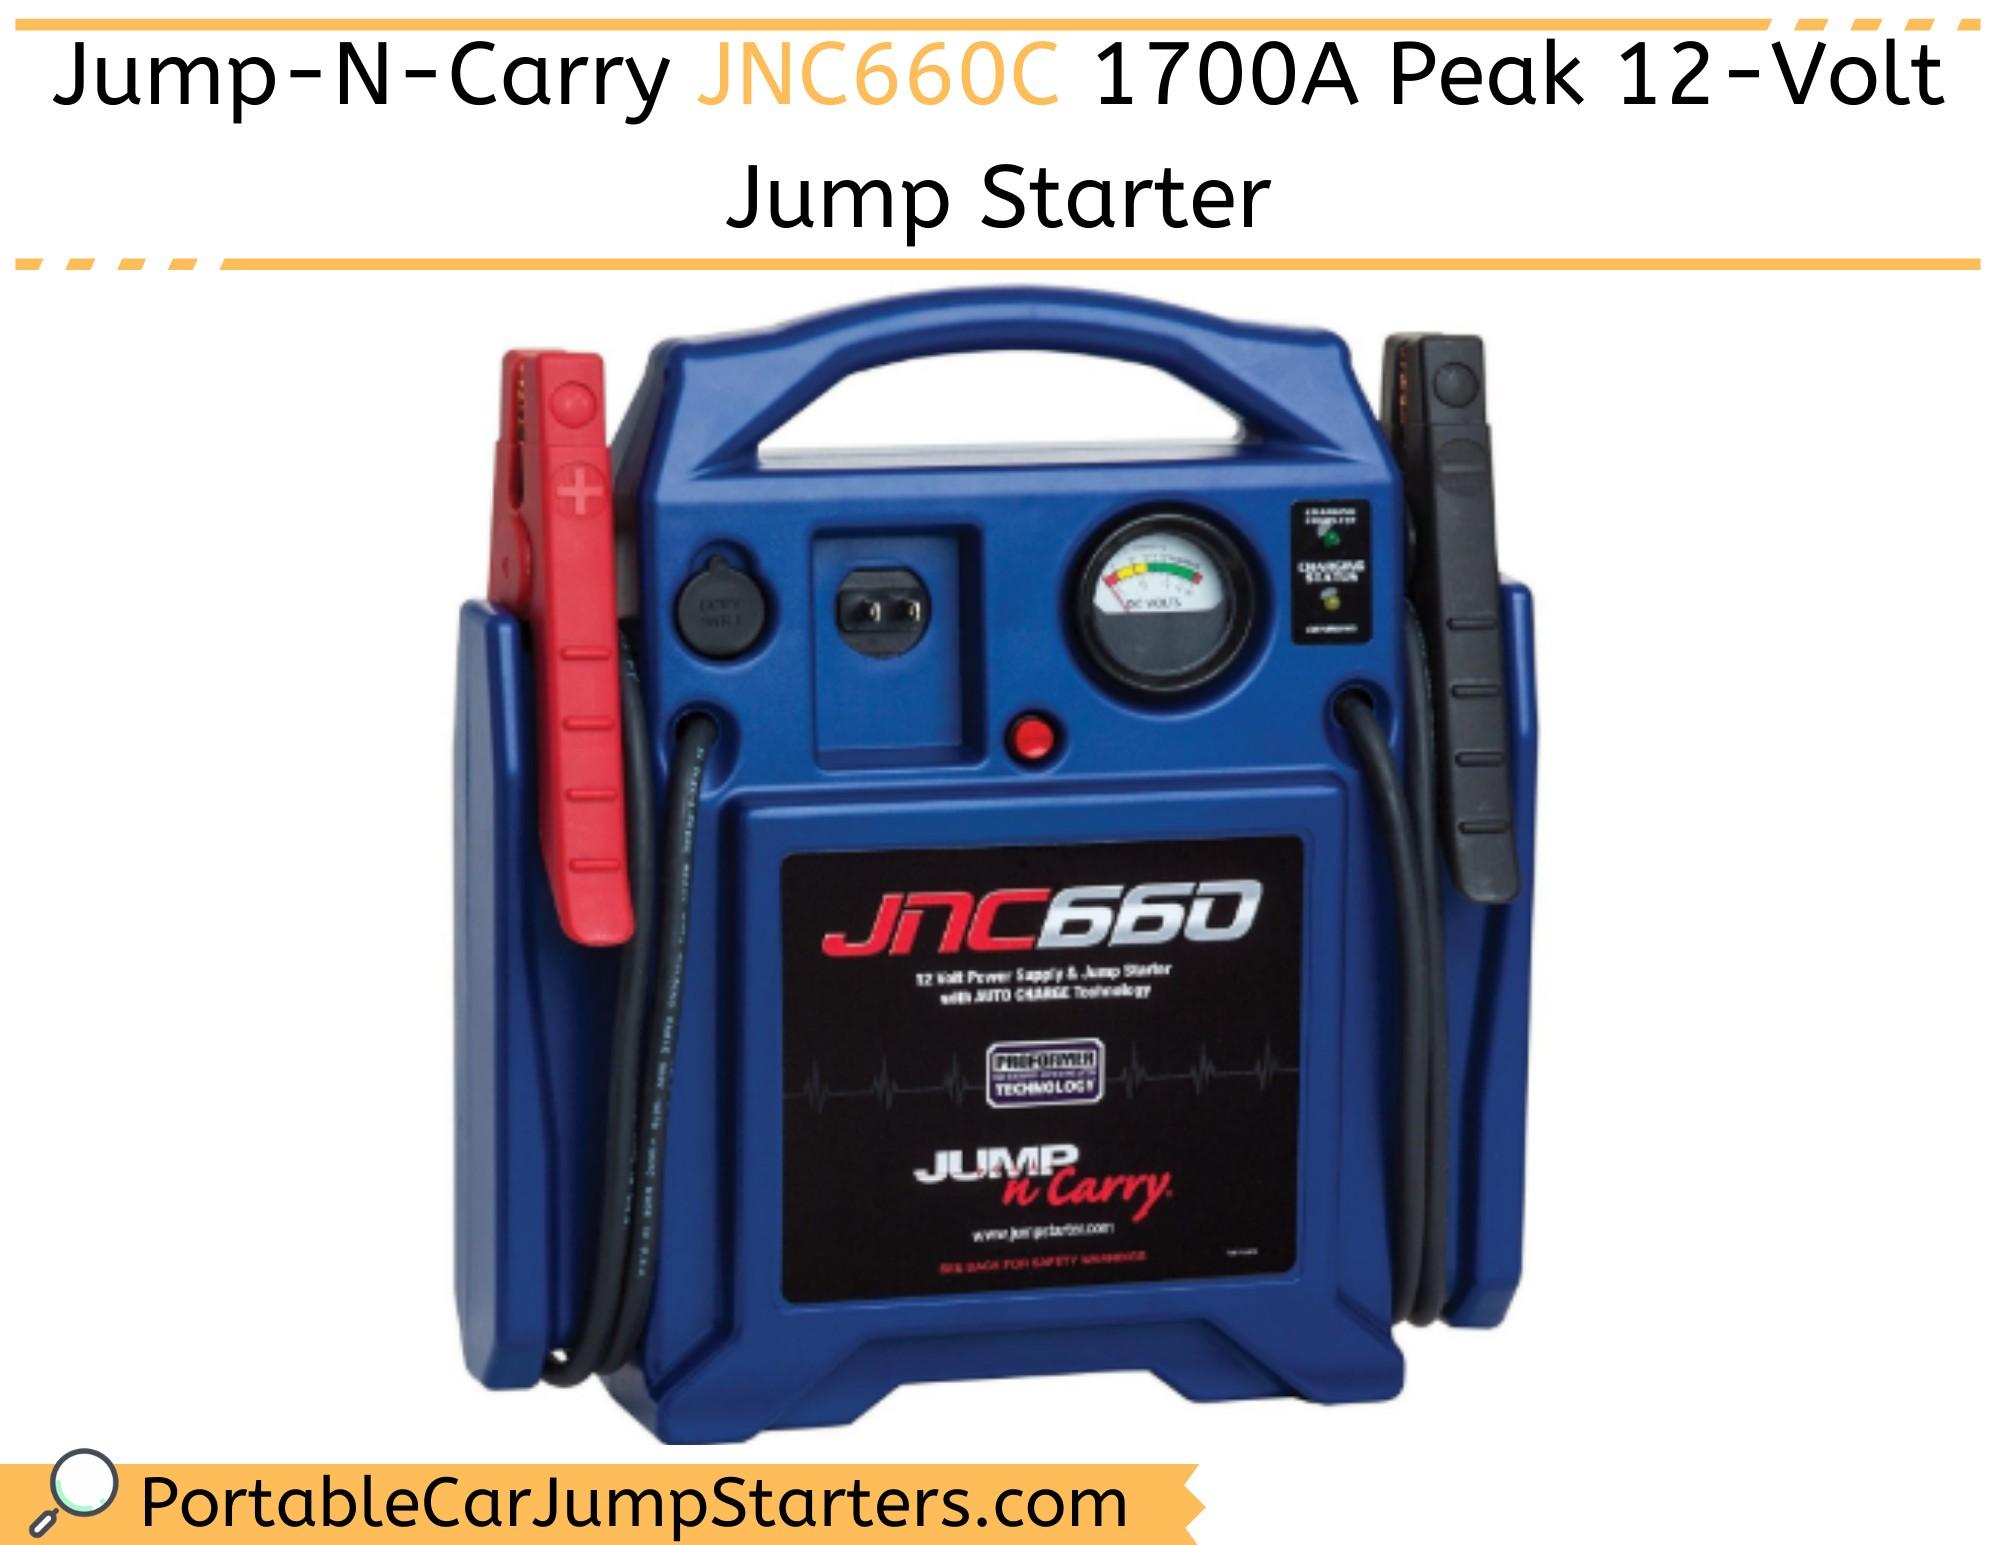 Thumbnail for Jump-N-Carry JNC660C 1700A Peak 12-Volt Jump Starter (CEC Compliant)